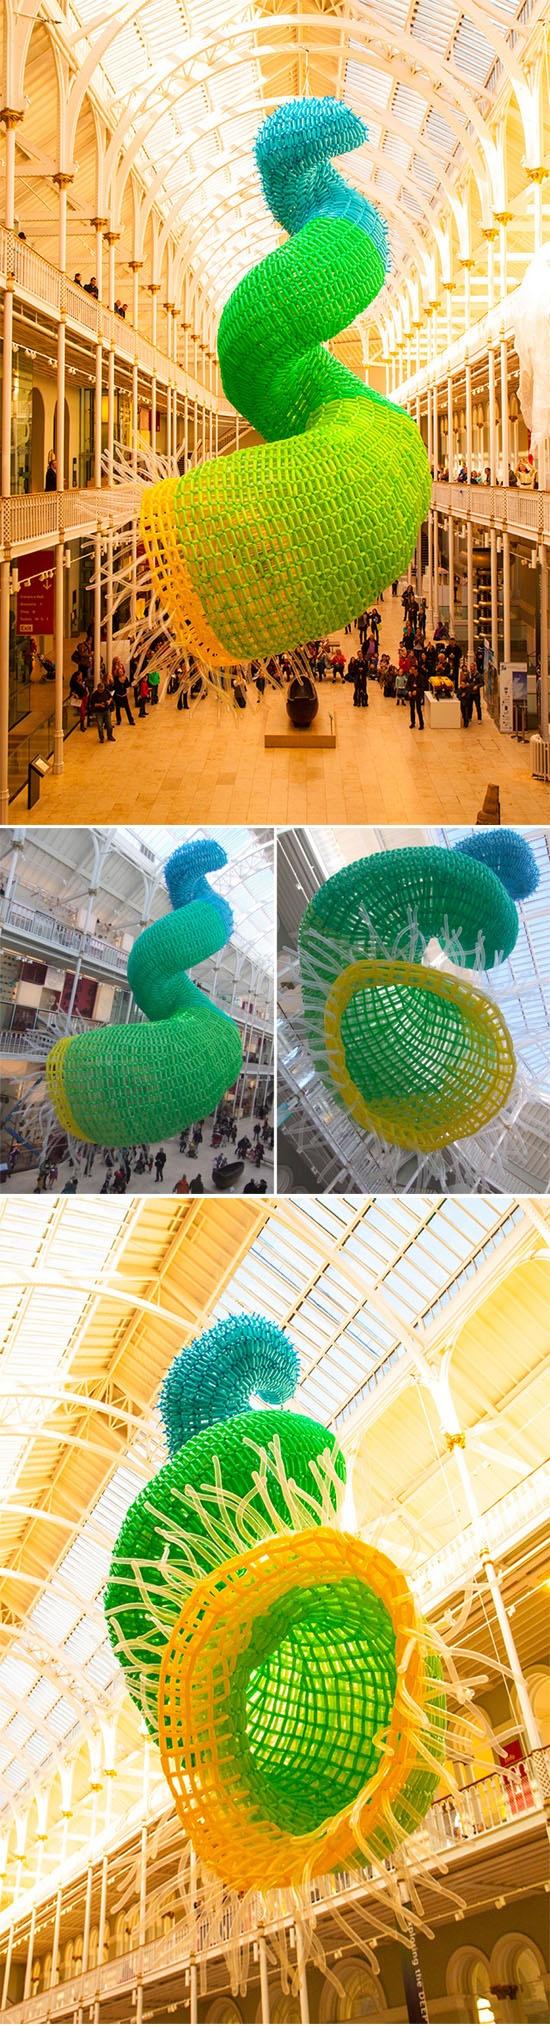 Massive New Balloon Sculpture at Edinburgh International Science Festival ( by Jason Hackenwerth )